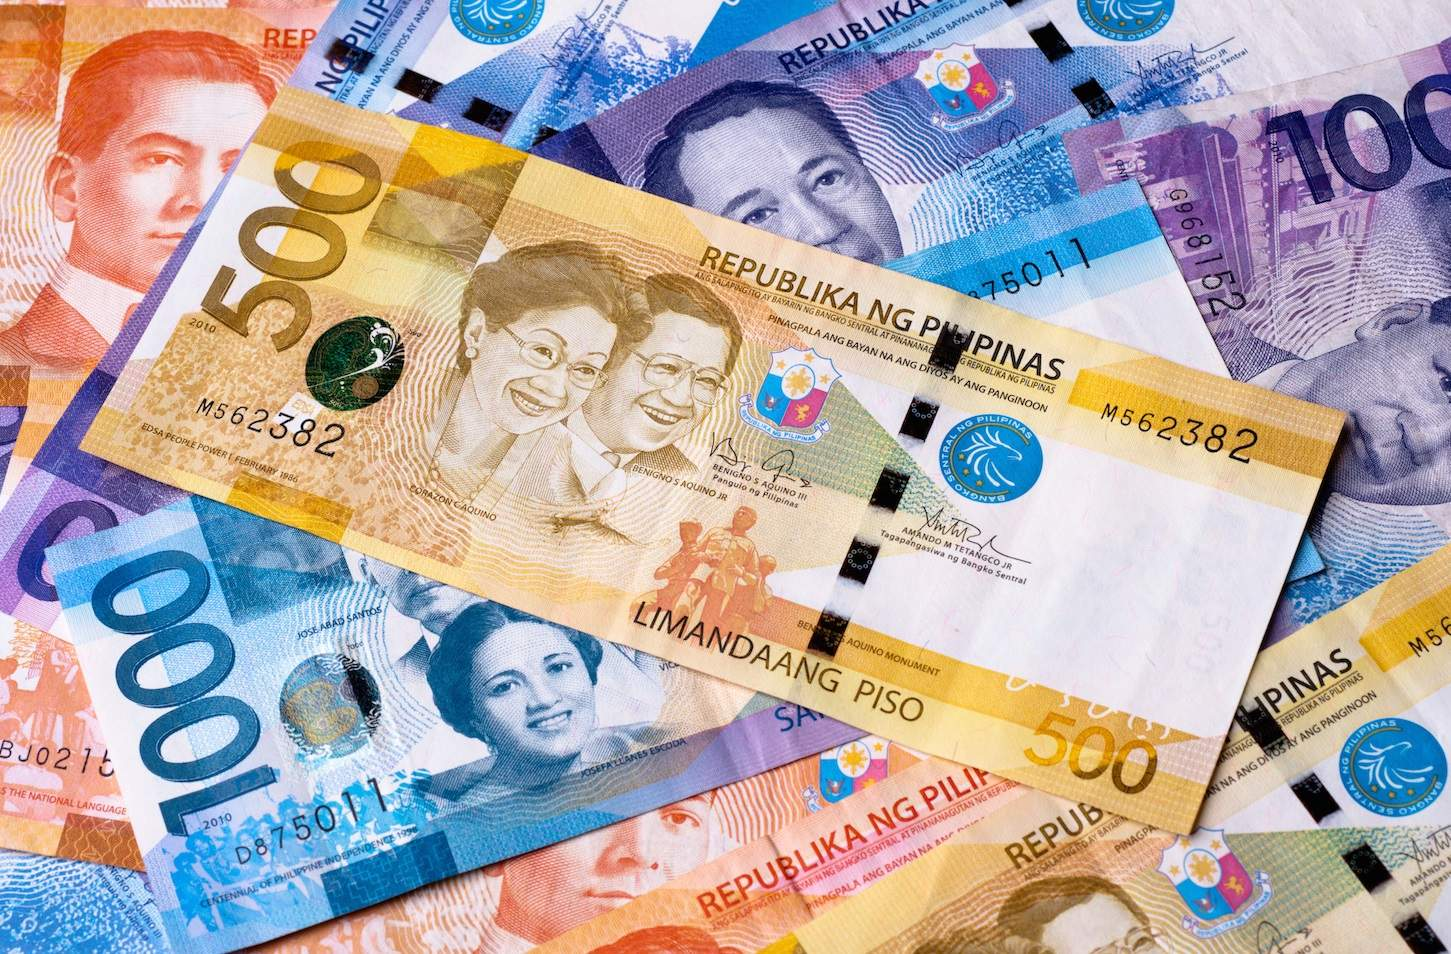 philippines_nen-lam-khi-du-lich-boracay-05